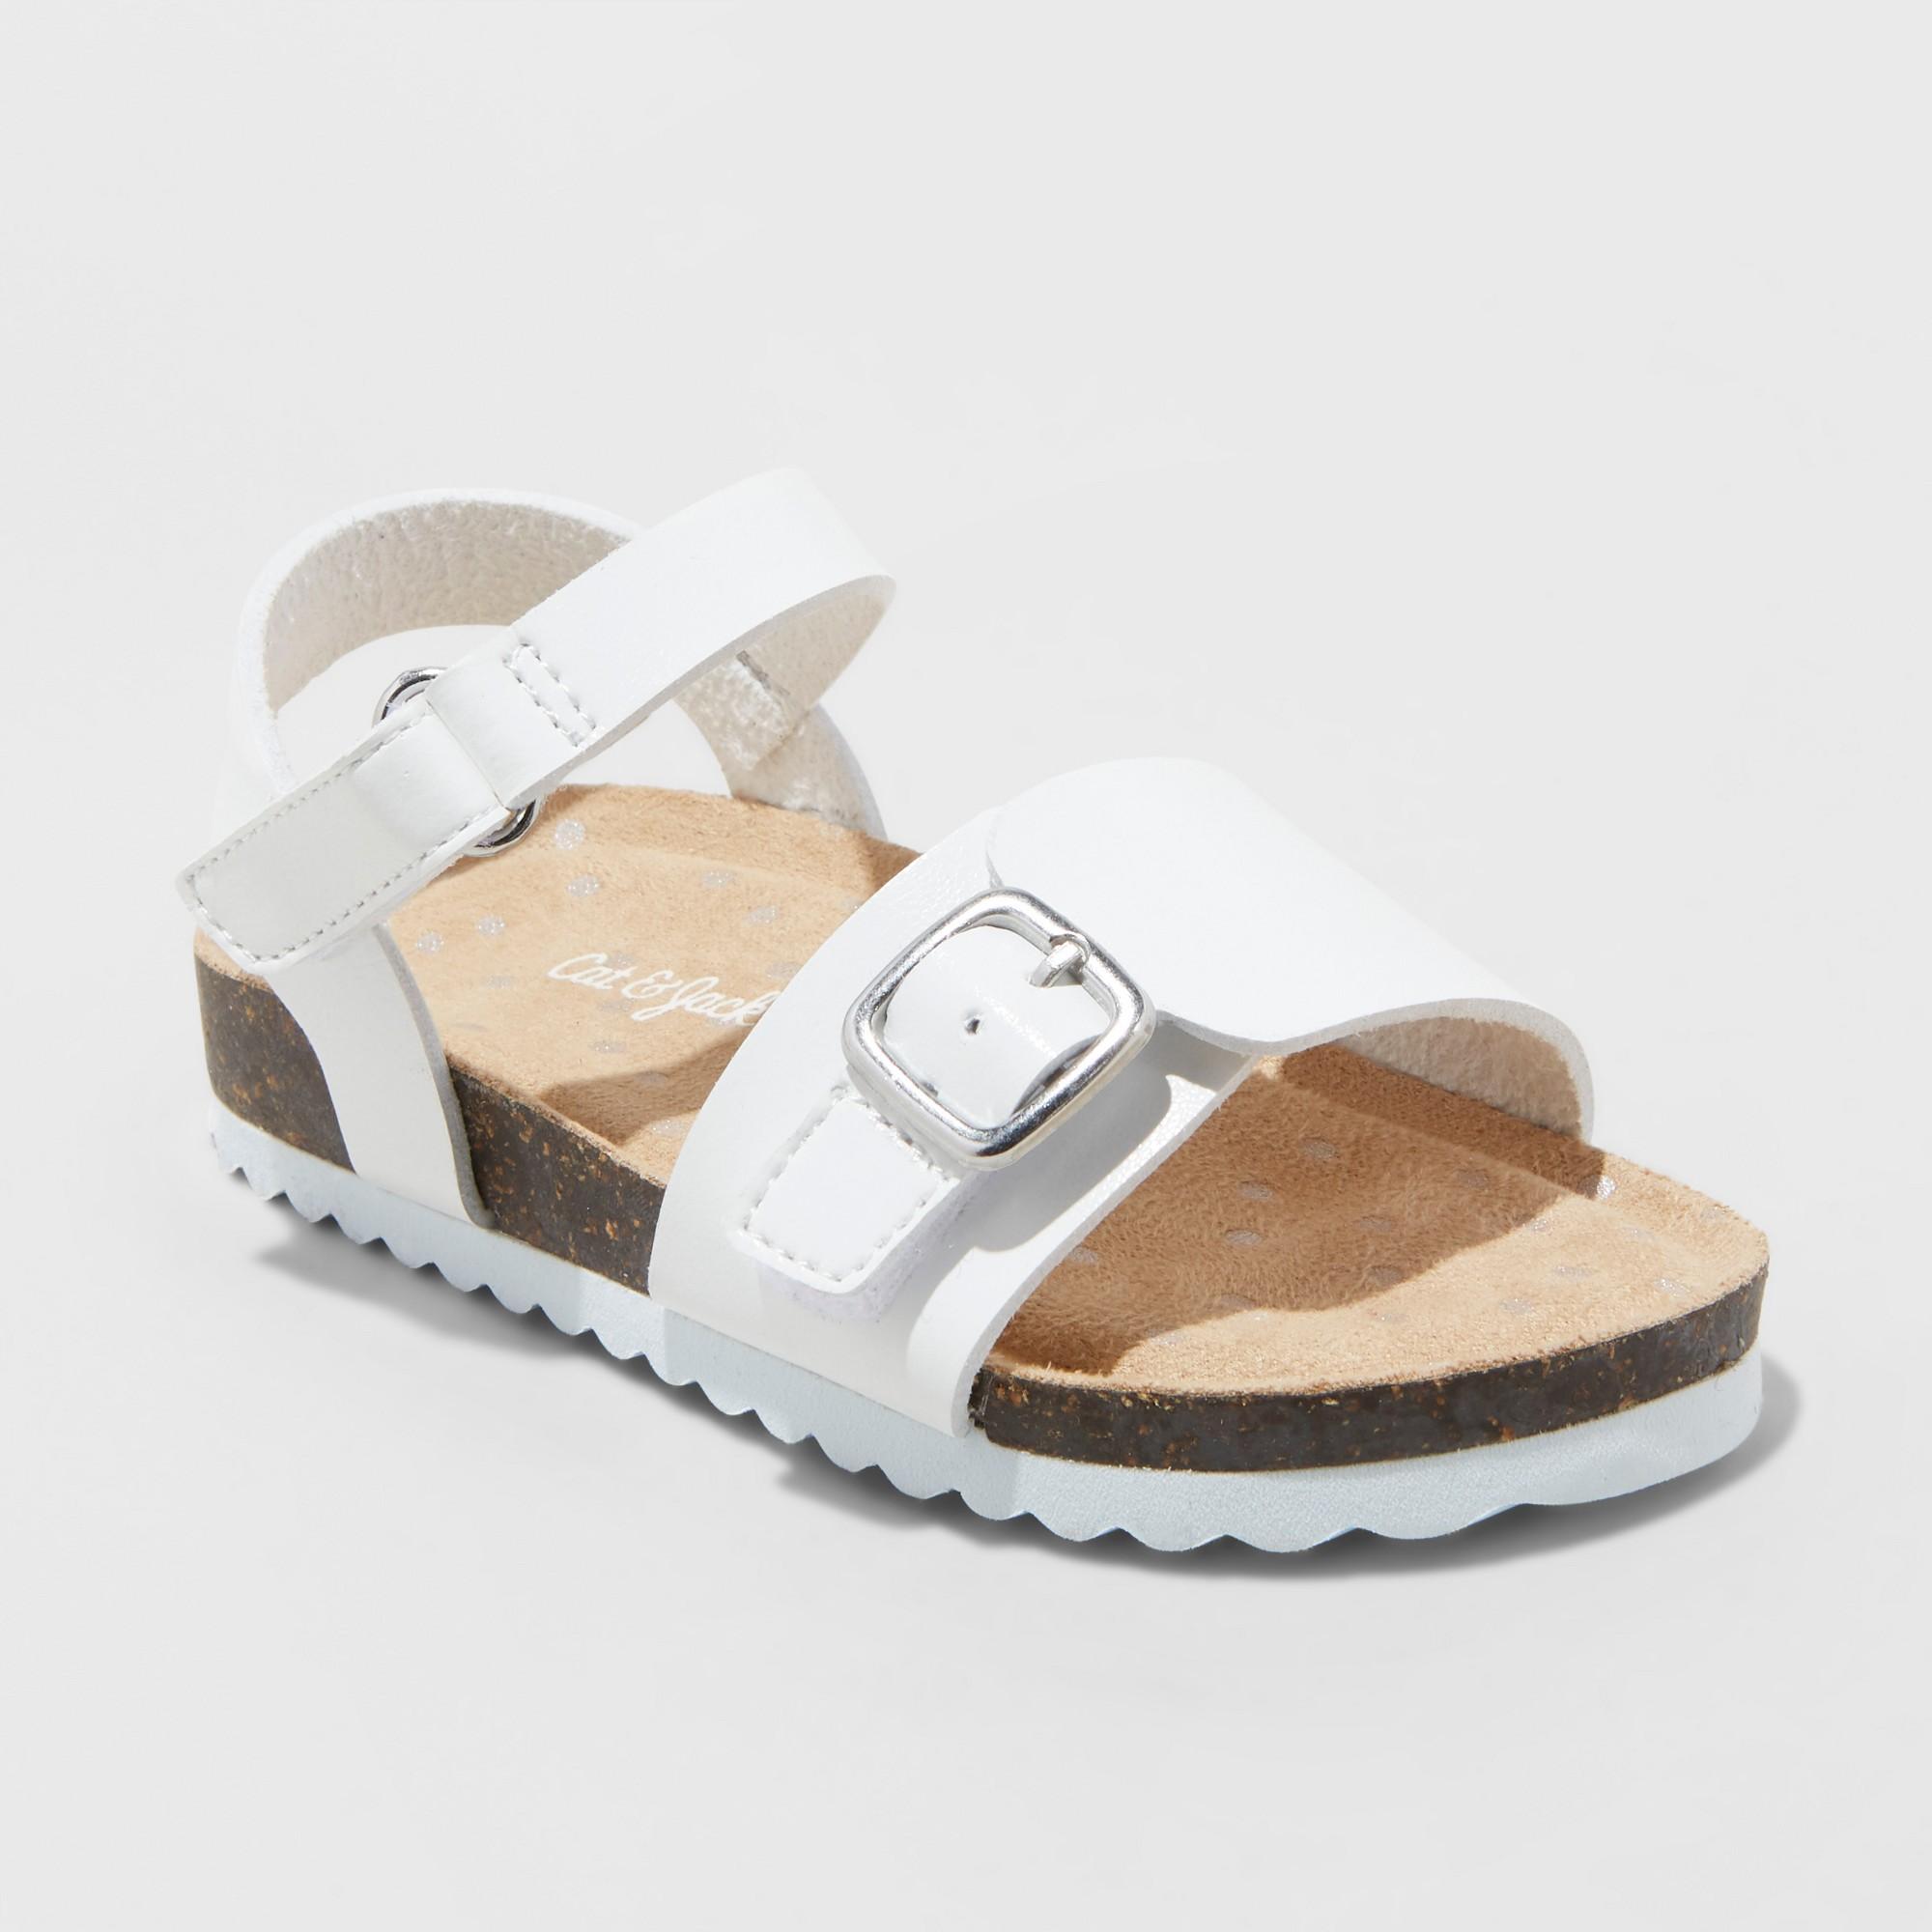 Toddler Girls' Berdie Comfort Footbed Sandals - Cat & Jack White 11